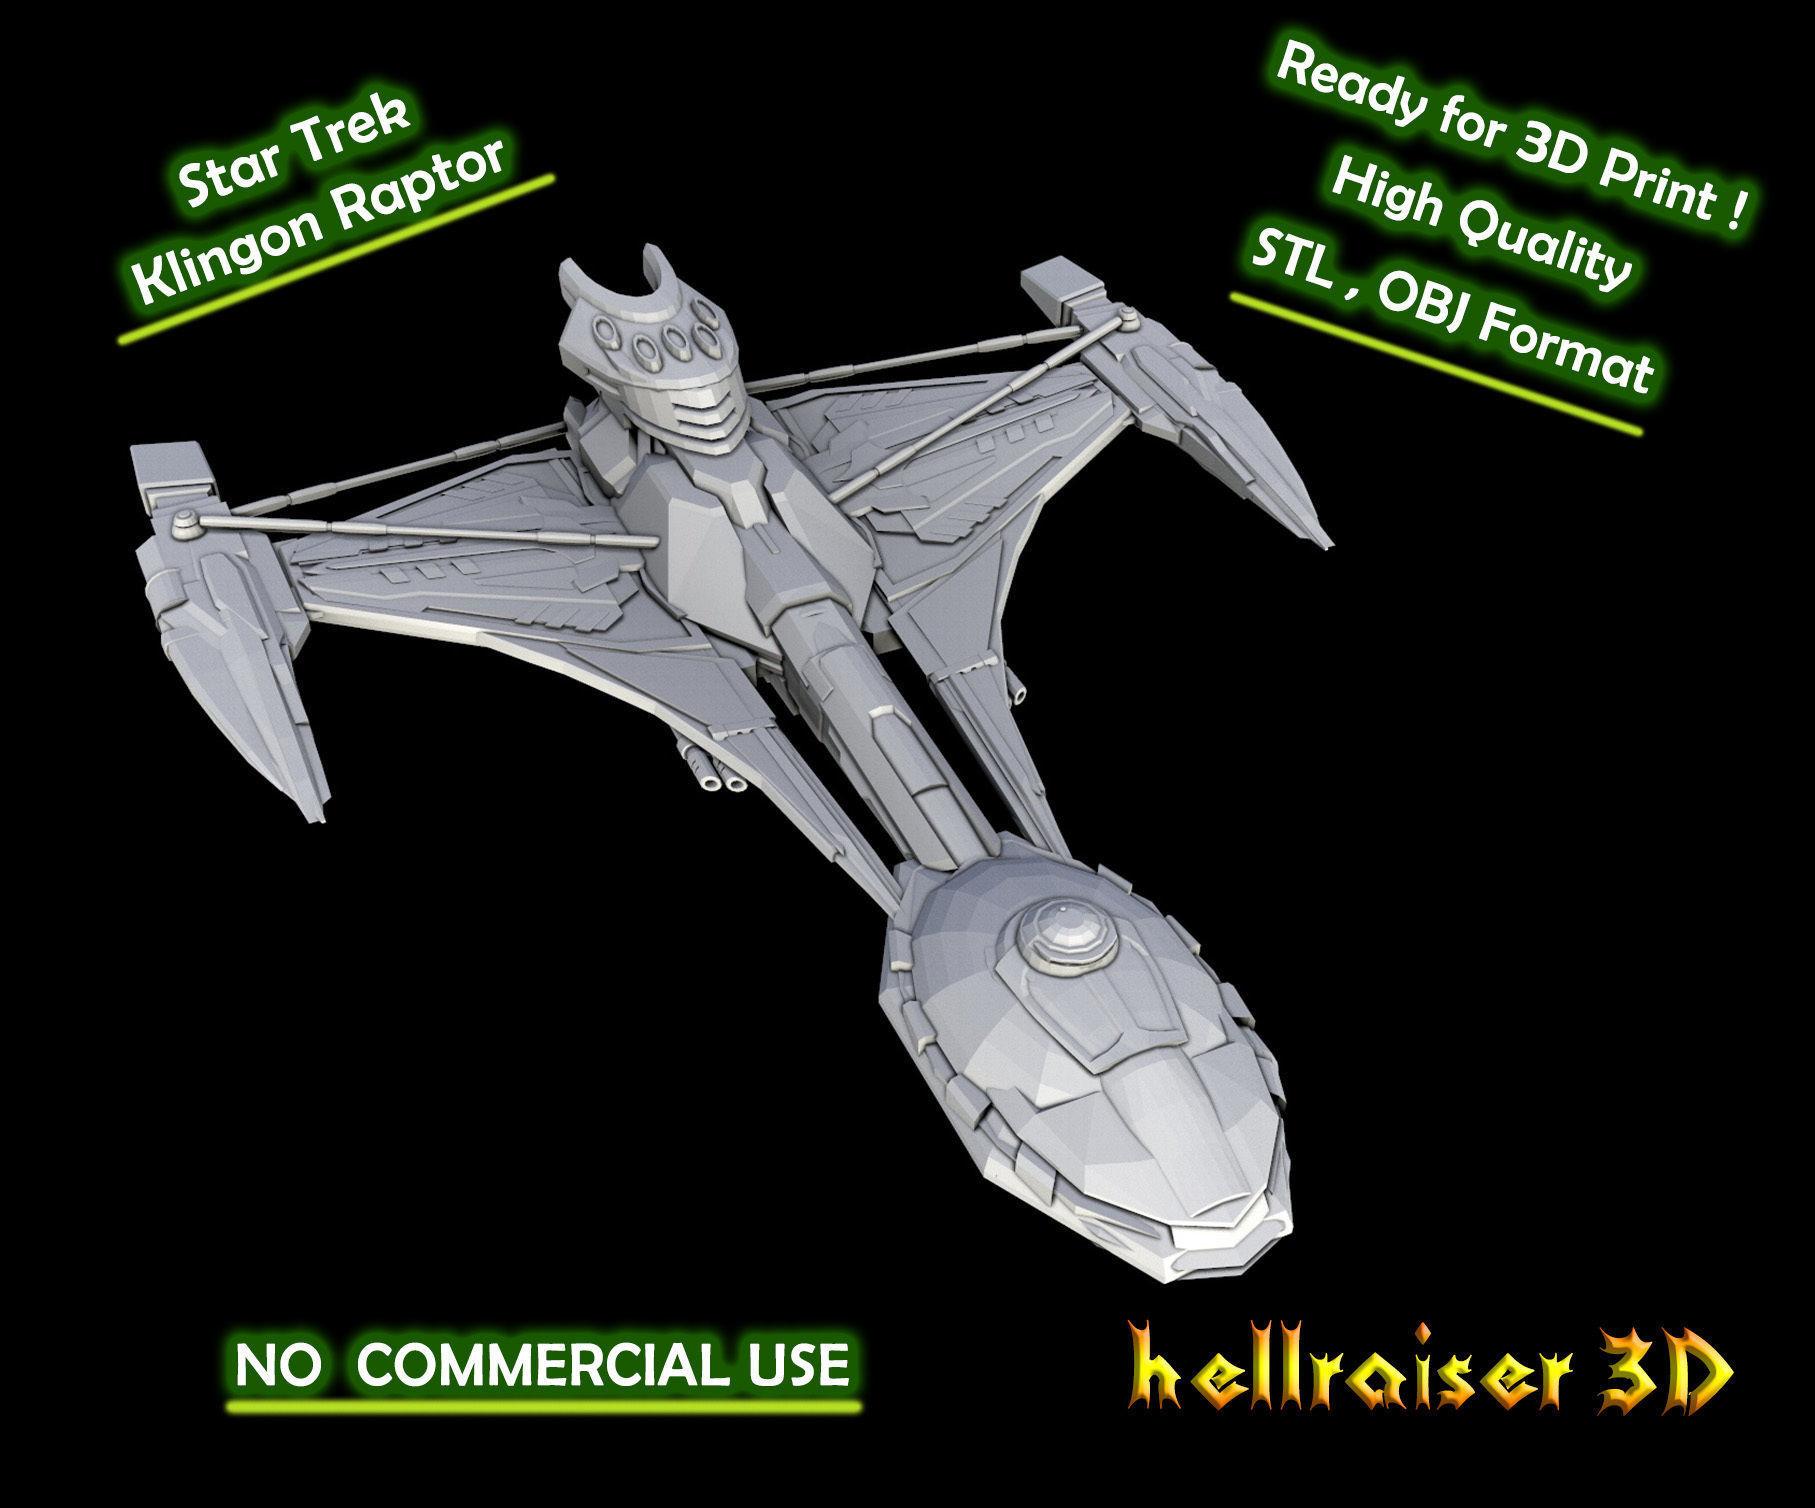 Star Trek - Klingon Raptor - 3D Printable Model